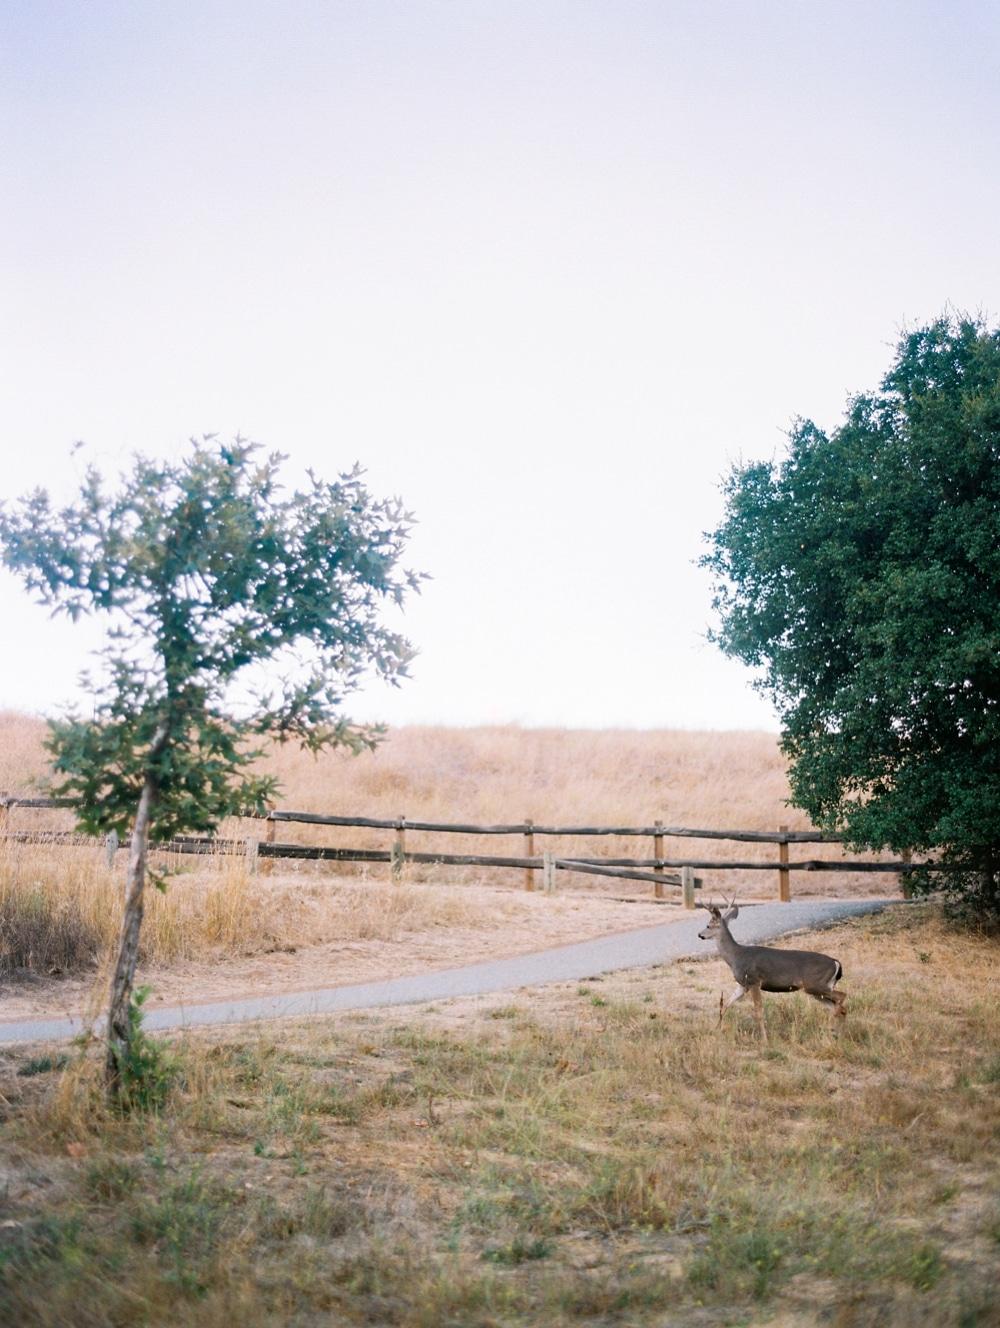 Kristin-La-Voie-Photography-california-wedding-photographer-dog-session-rancho-san-antonio-los-altos-17